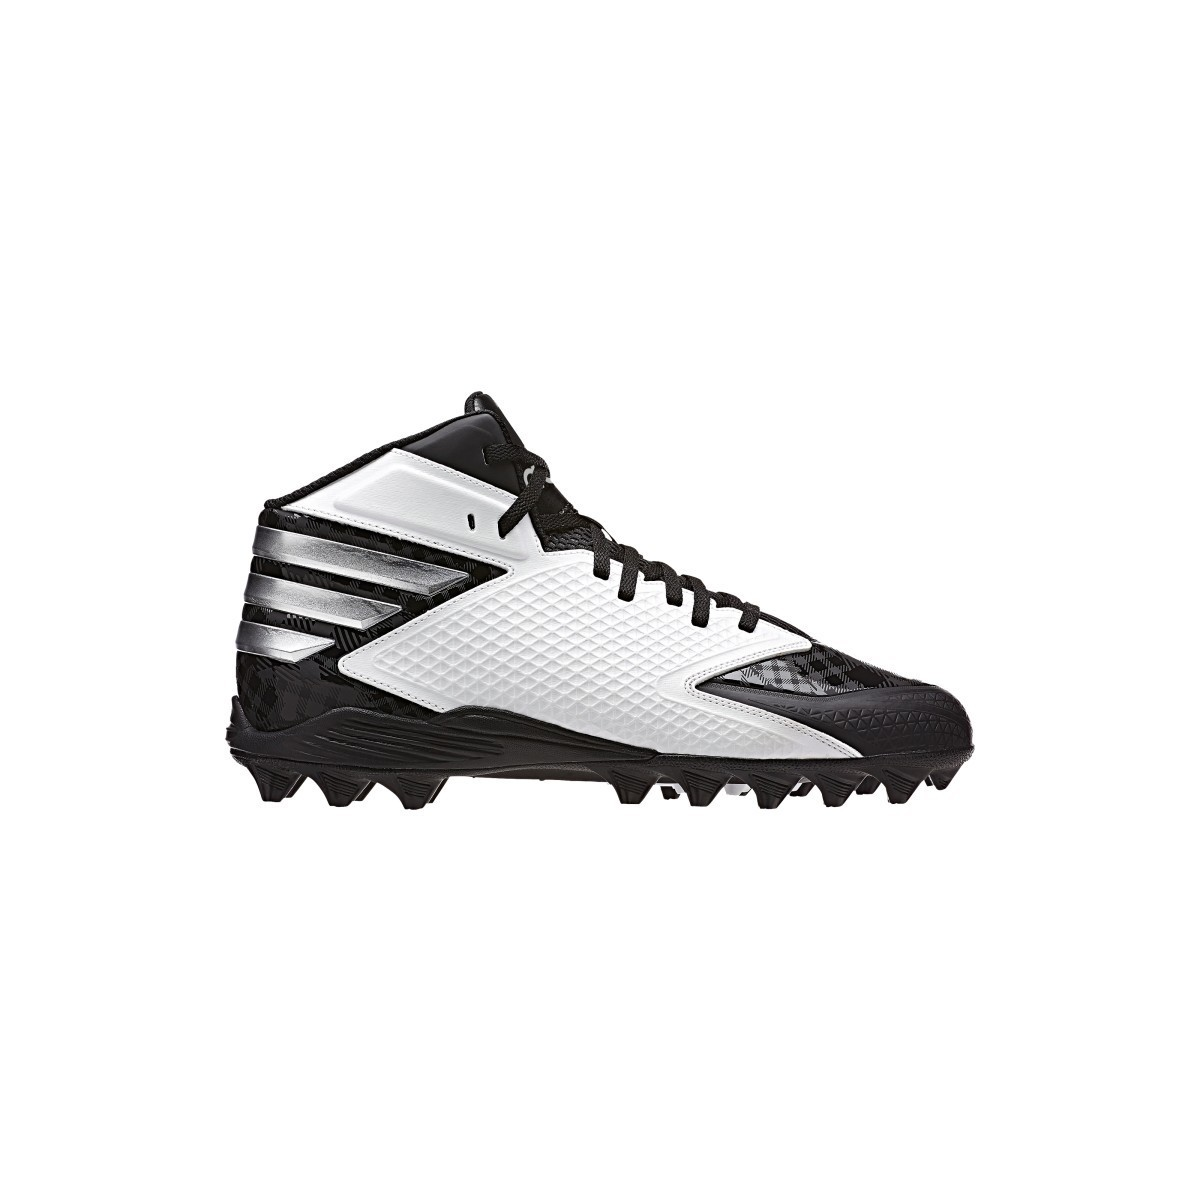 Bianconero Football Americano D70143 Md Scarpe Freak Adidas Scarpa 6gOZFZI